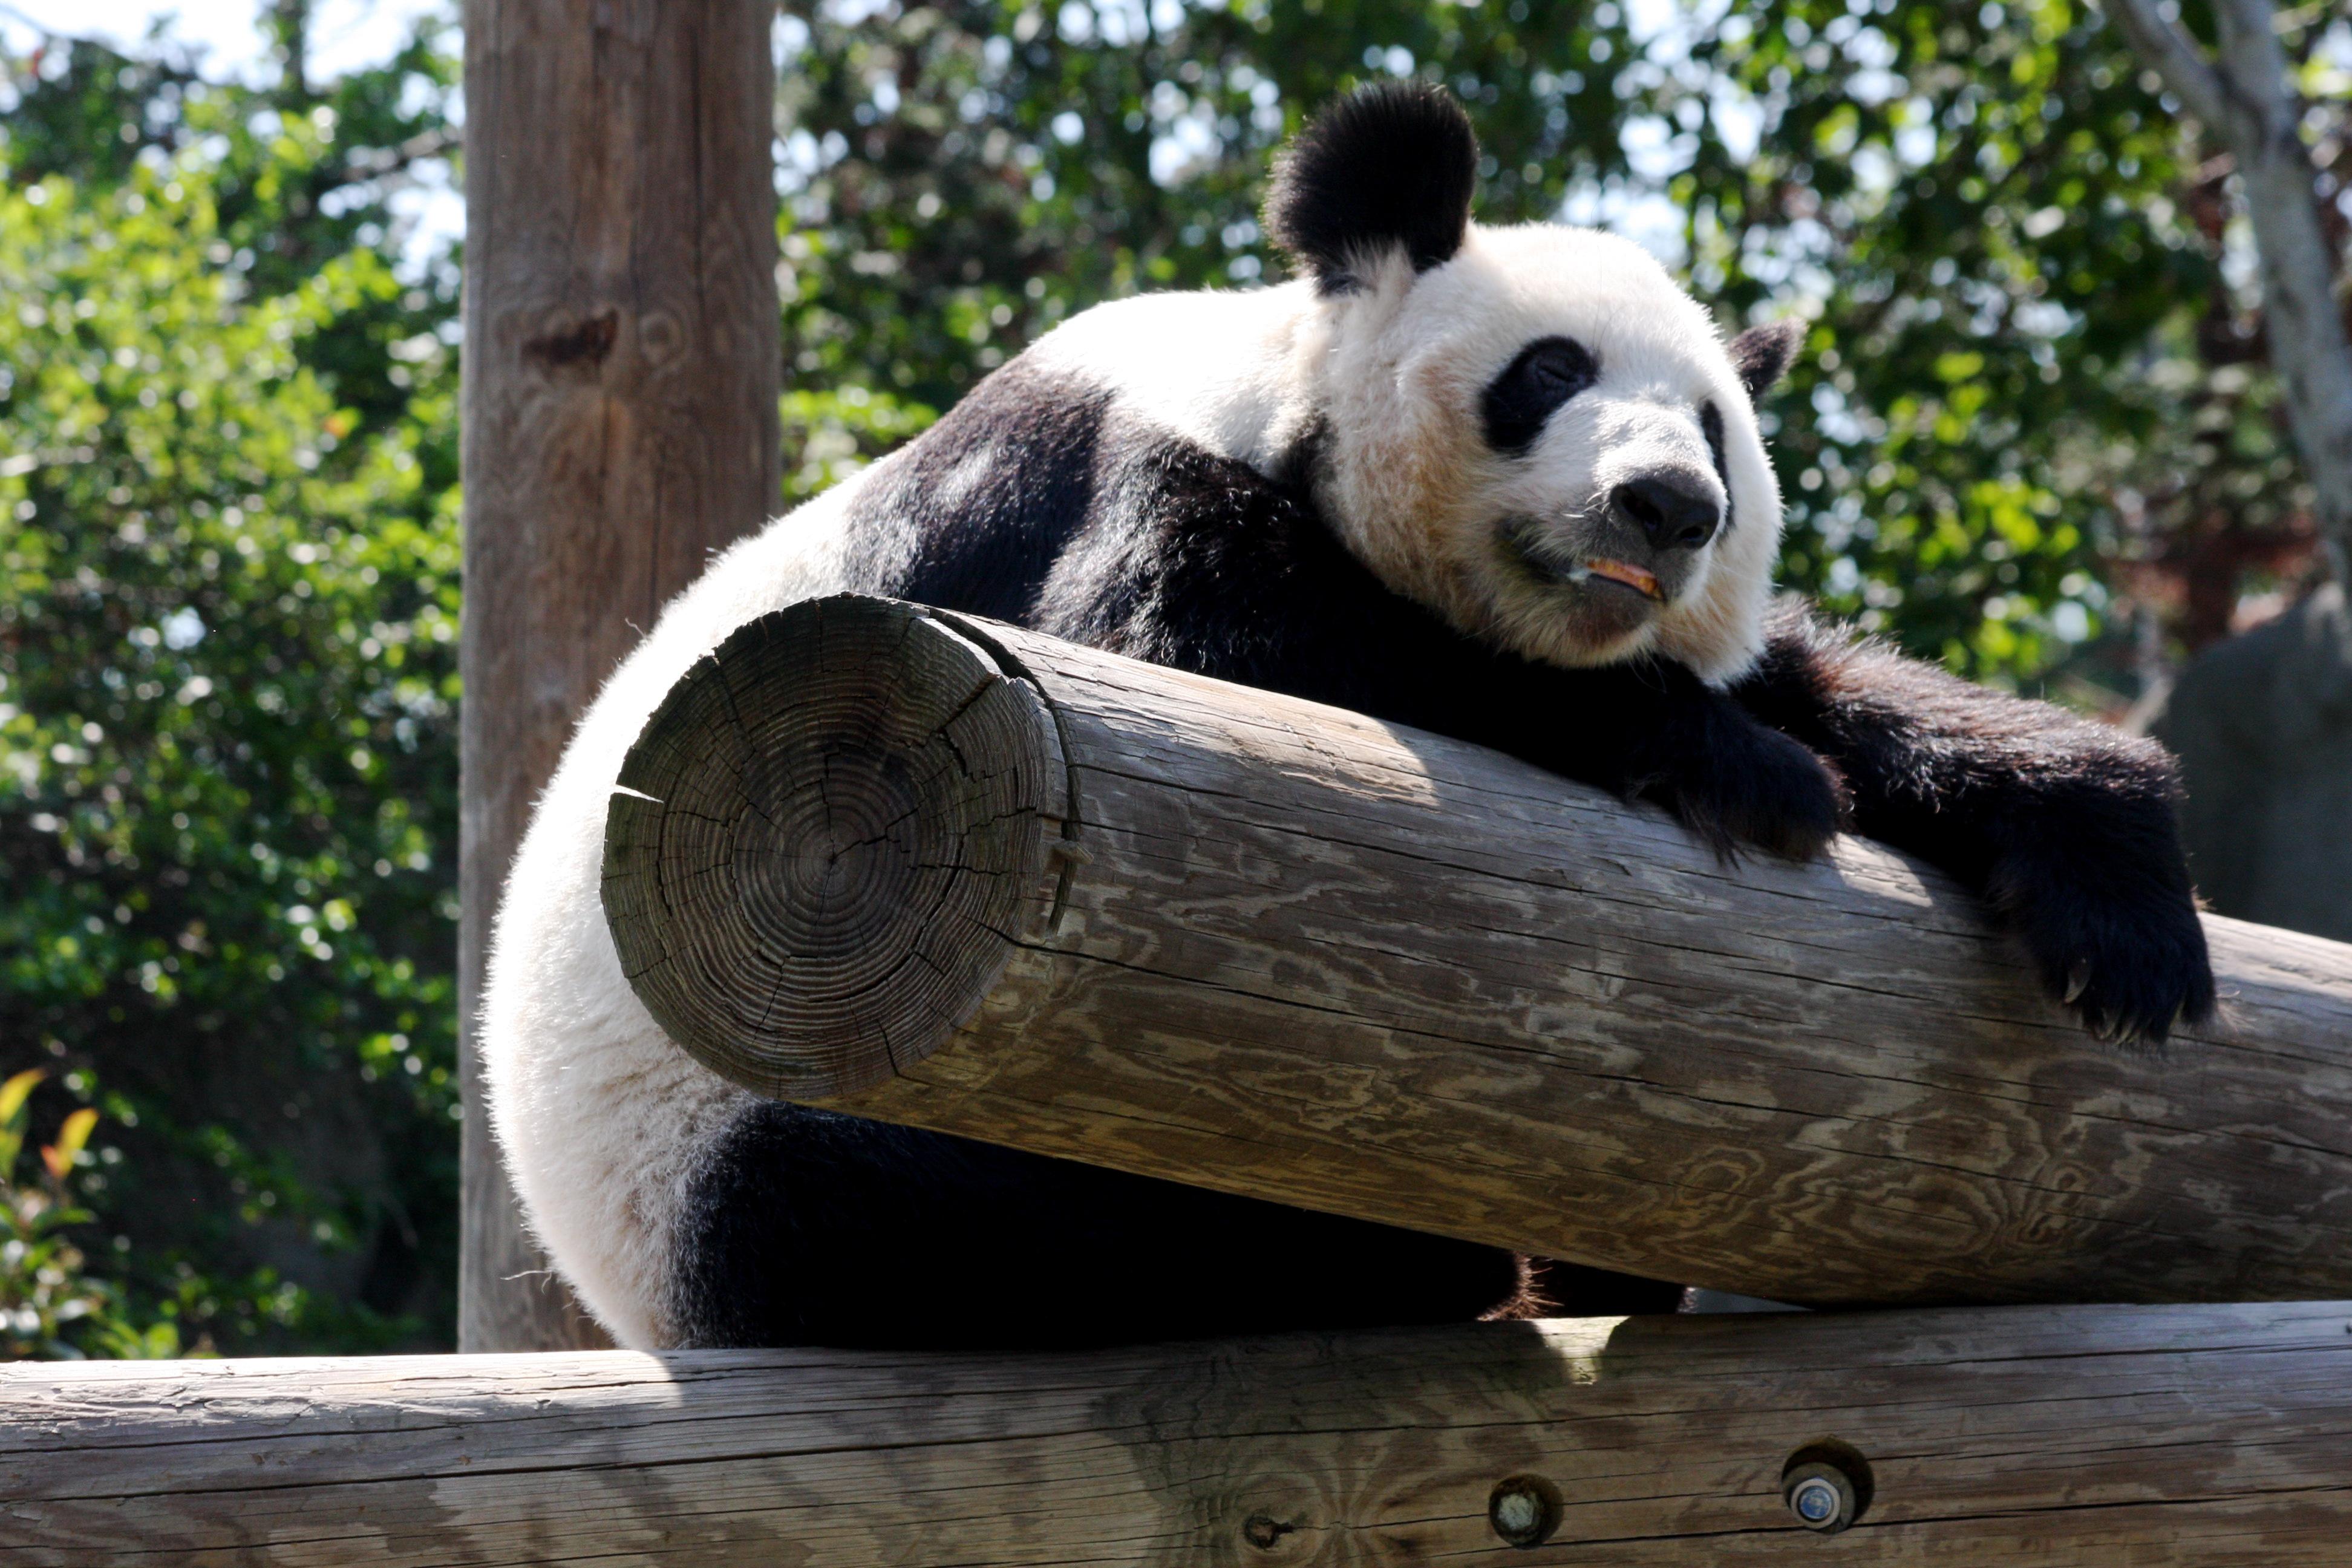 Hewan Purba2016 Panda Petting Zoo United States Images